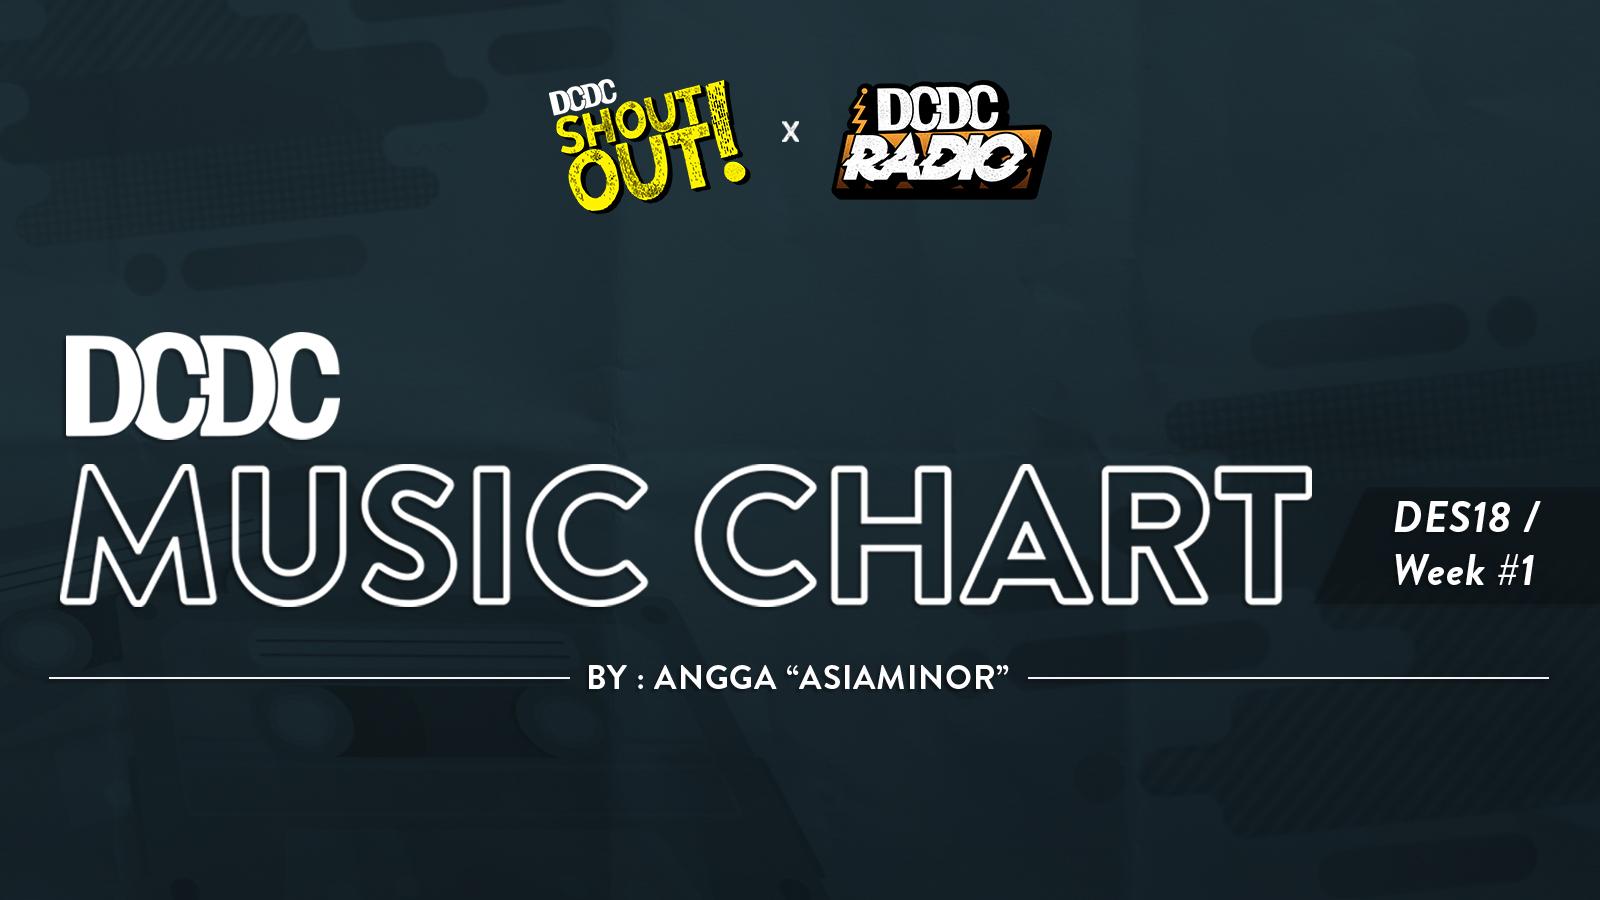 DCDC Music Chart - #1st Week of December 2018